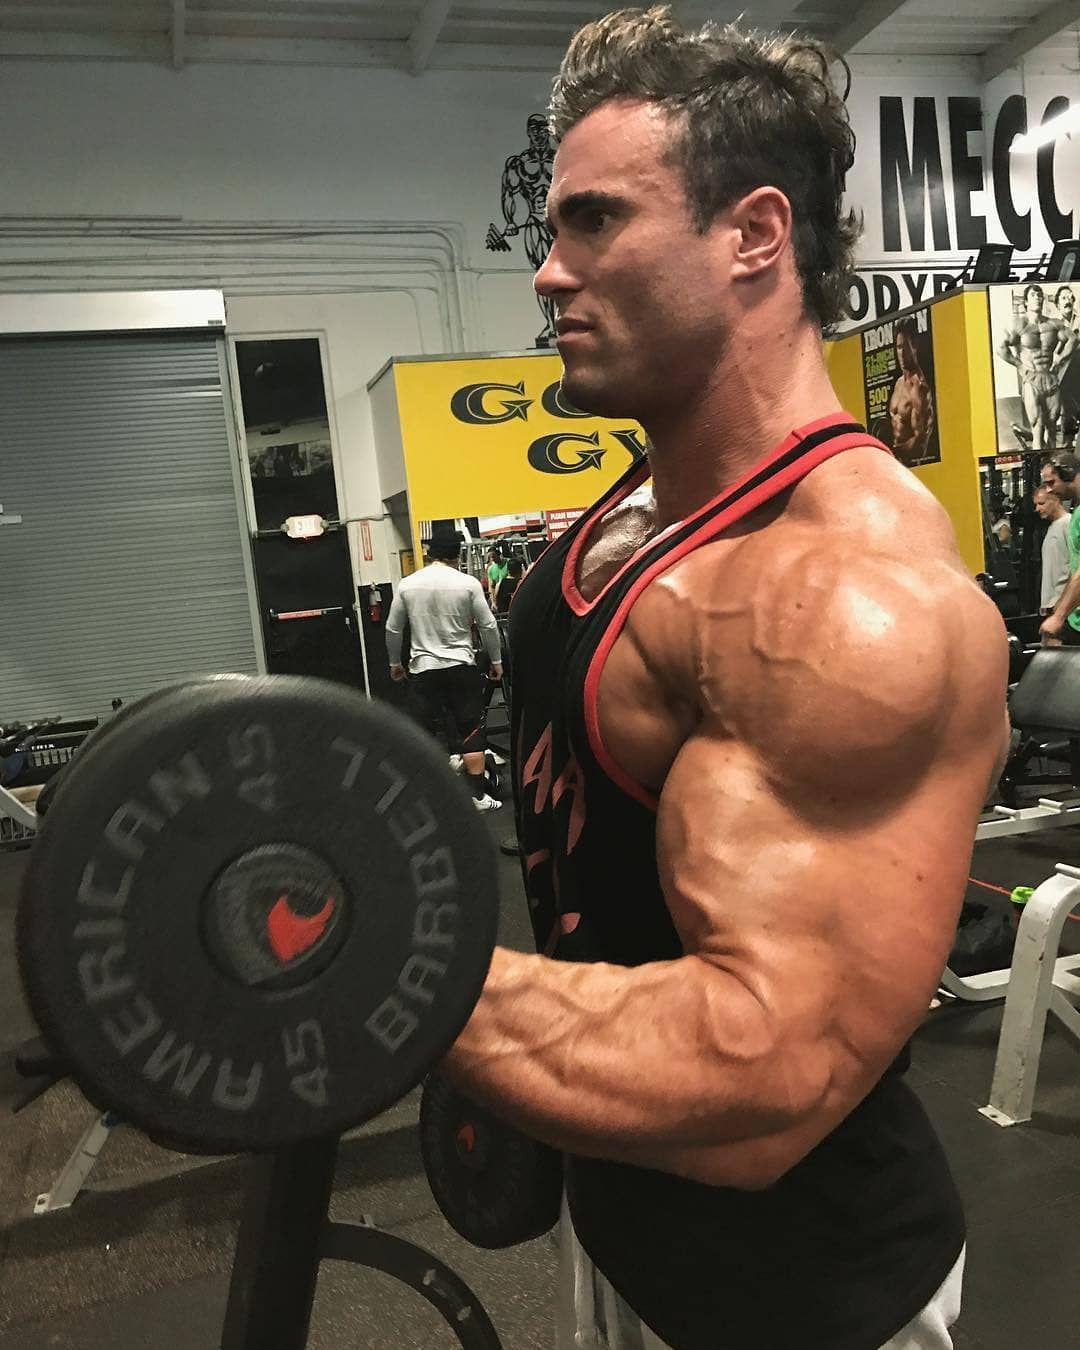 Rafael muscled arse pound